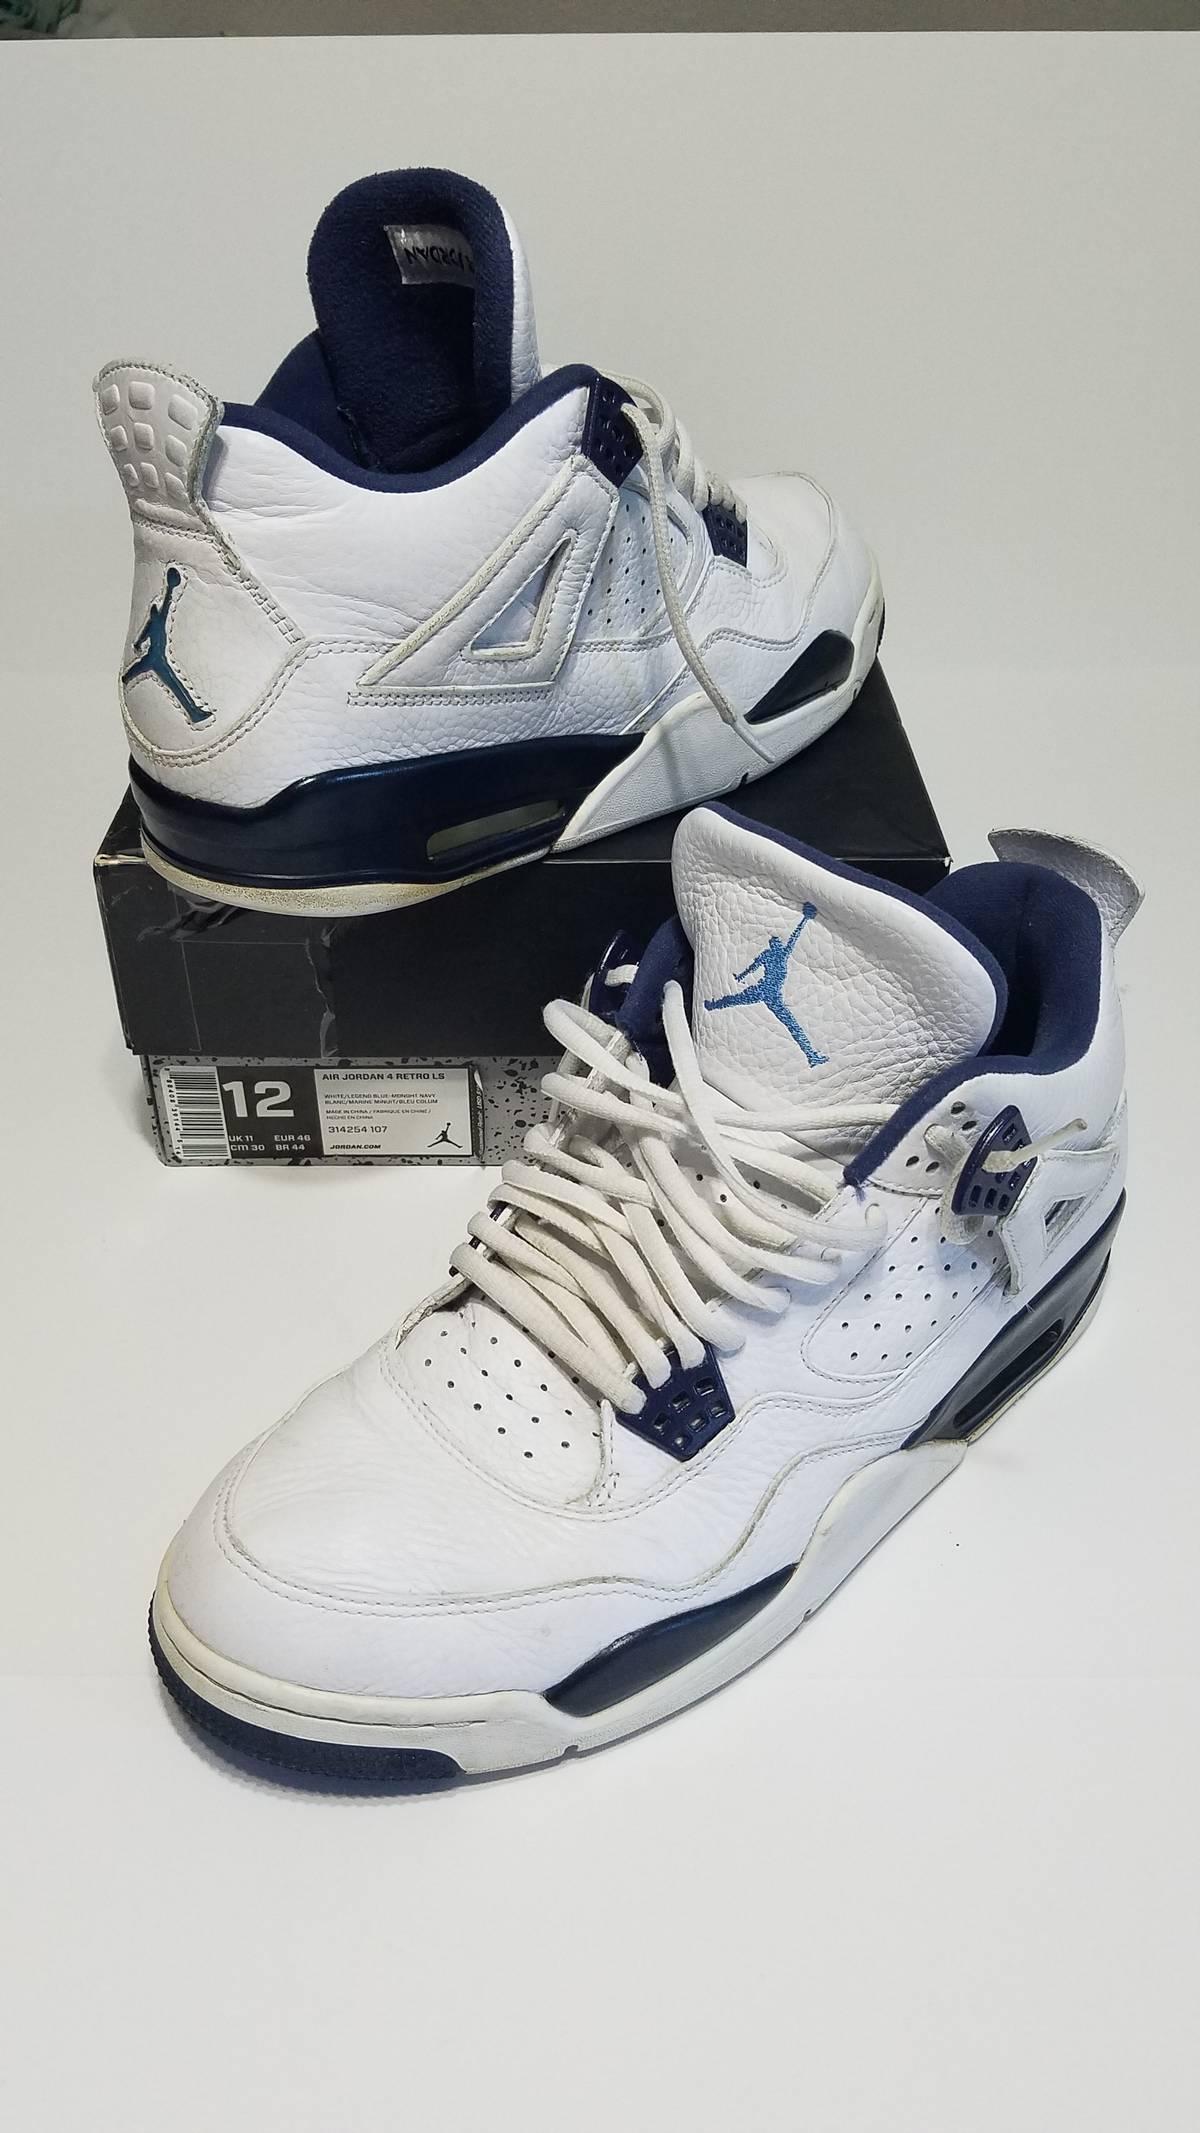 separation shoes 786fb a2719 Jordan Brand Air Jordan 4 Retro Ls Legend Blue Usa Seller Size 12 $84